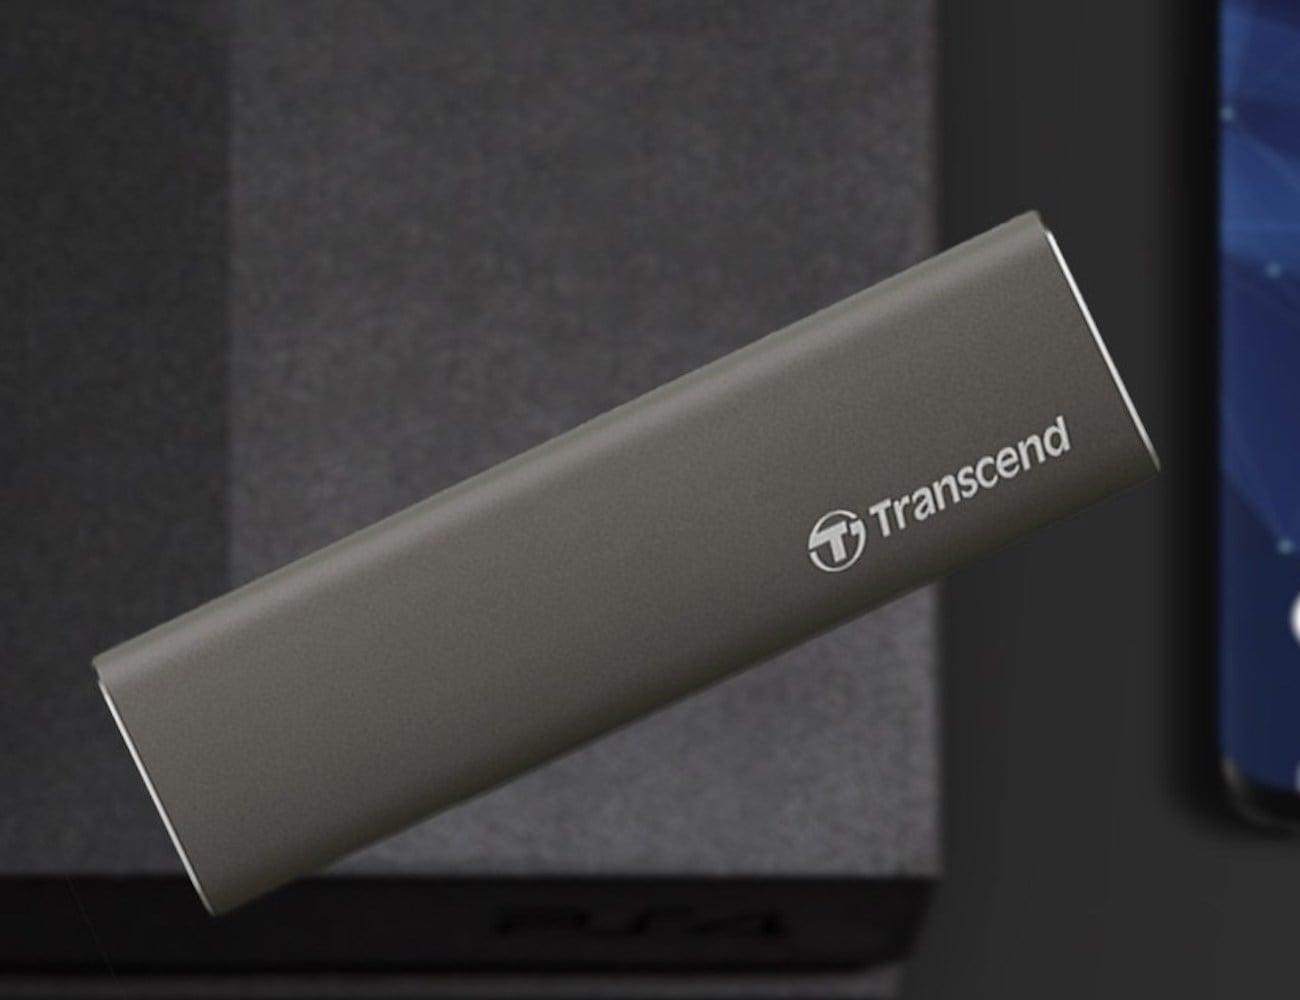 Transcend ESD250C Sleek Portable SSD boasts fast transfer speeds